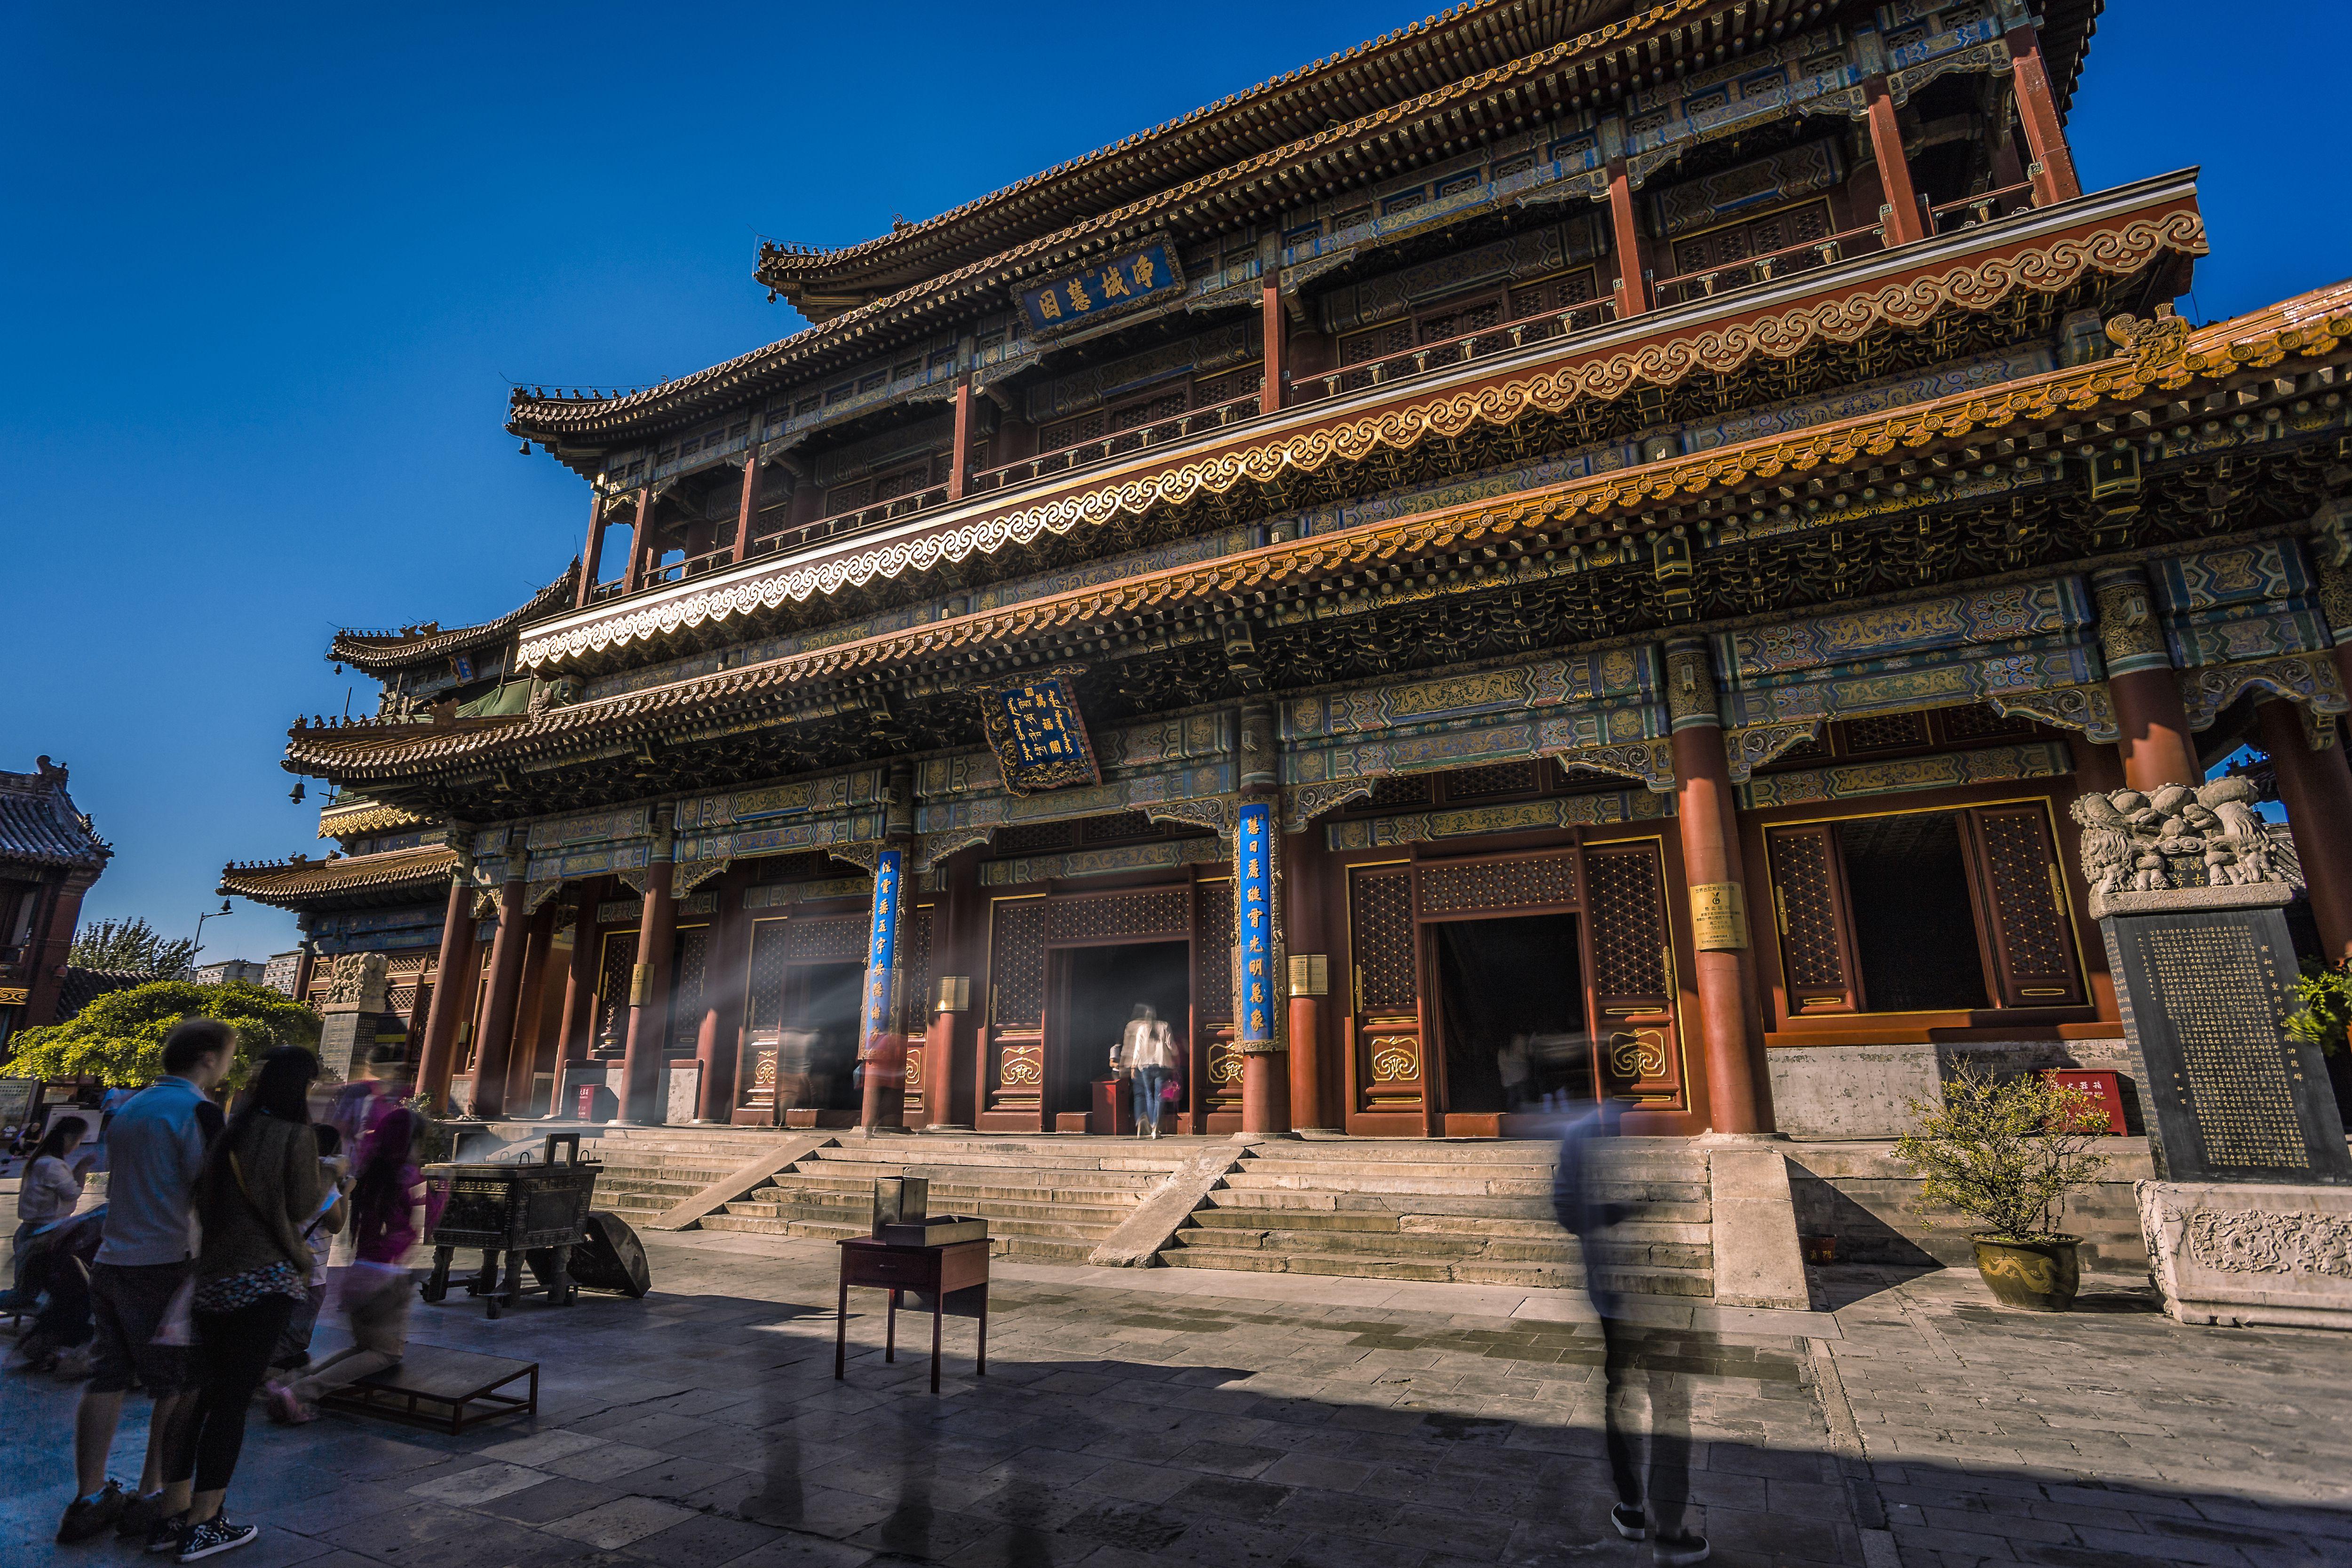 Blue sky behind the Lama Temple in Beijing